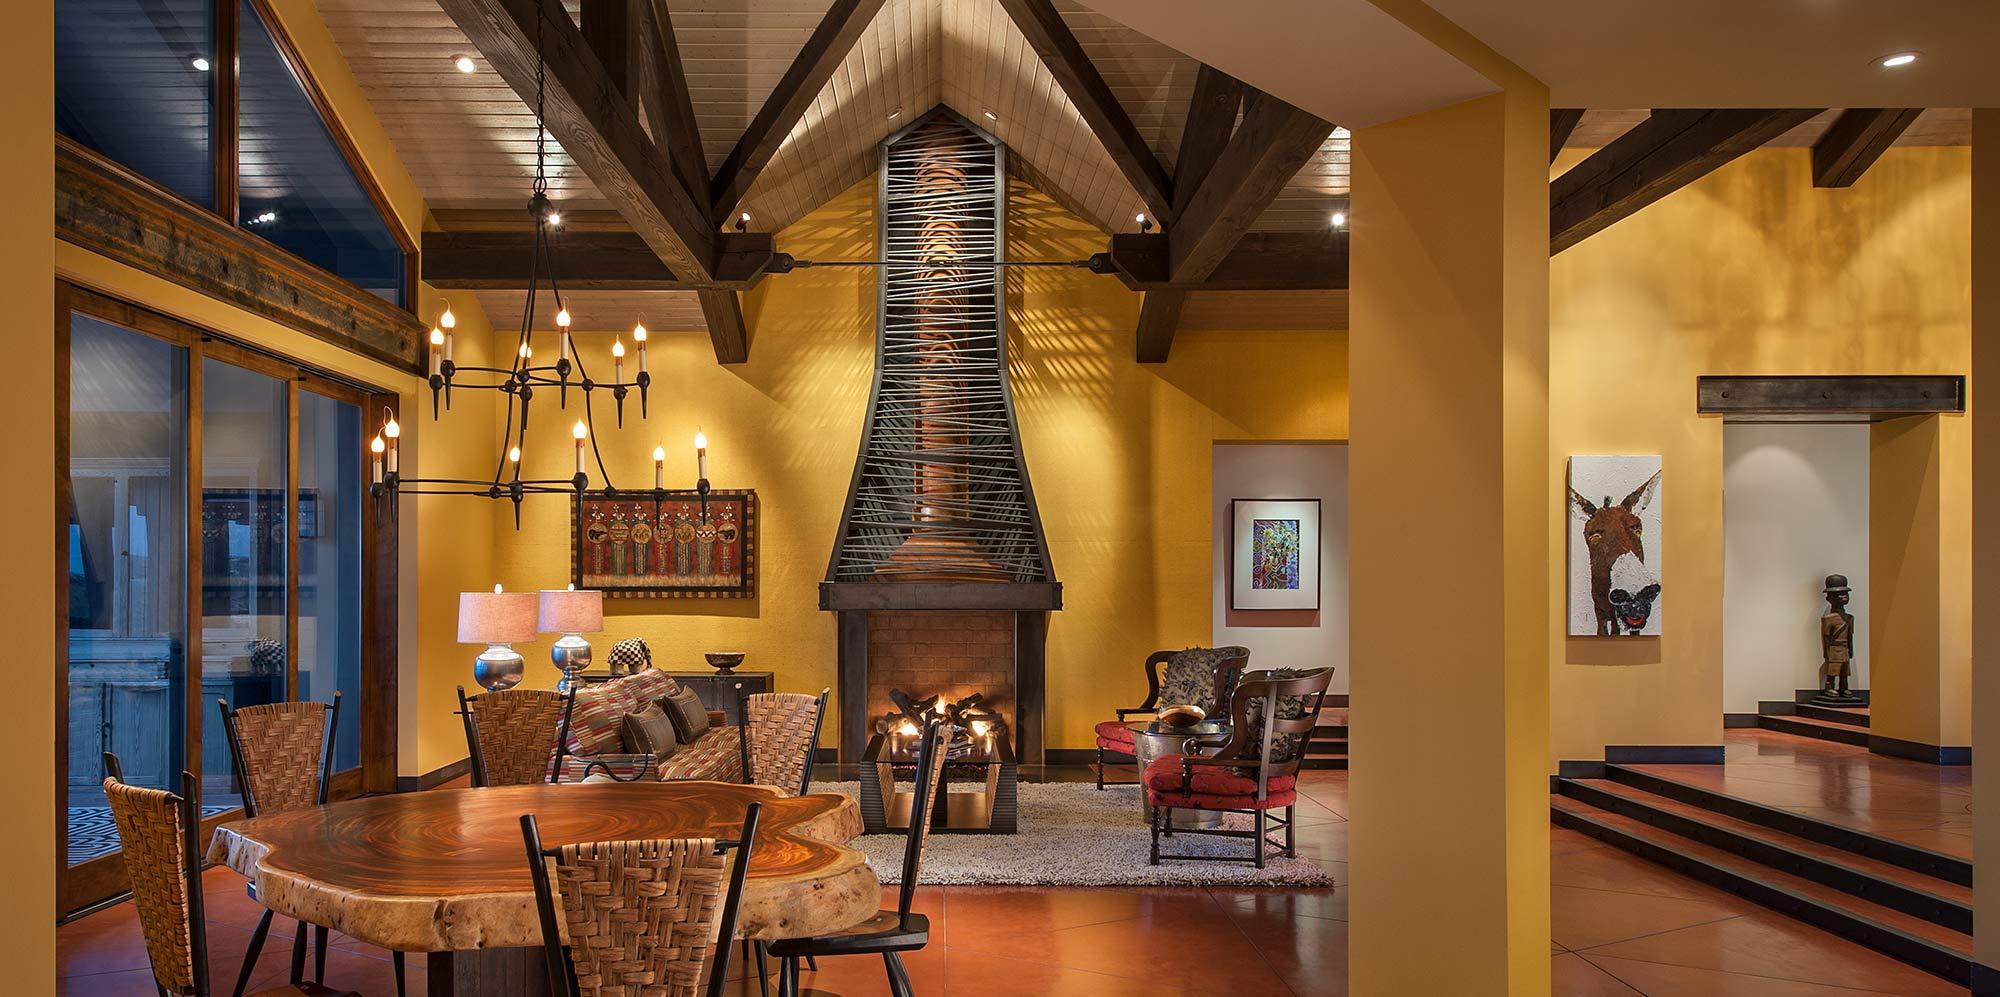 Interior Design Services In Scottsdale Arizona + Paradise Valley   Angelica  Henry Design V3